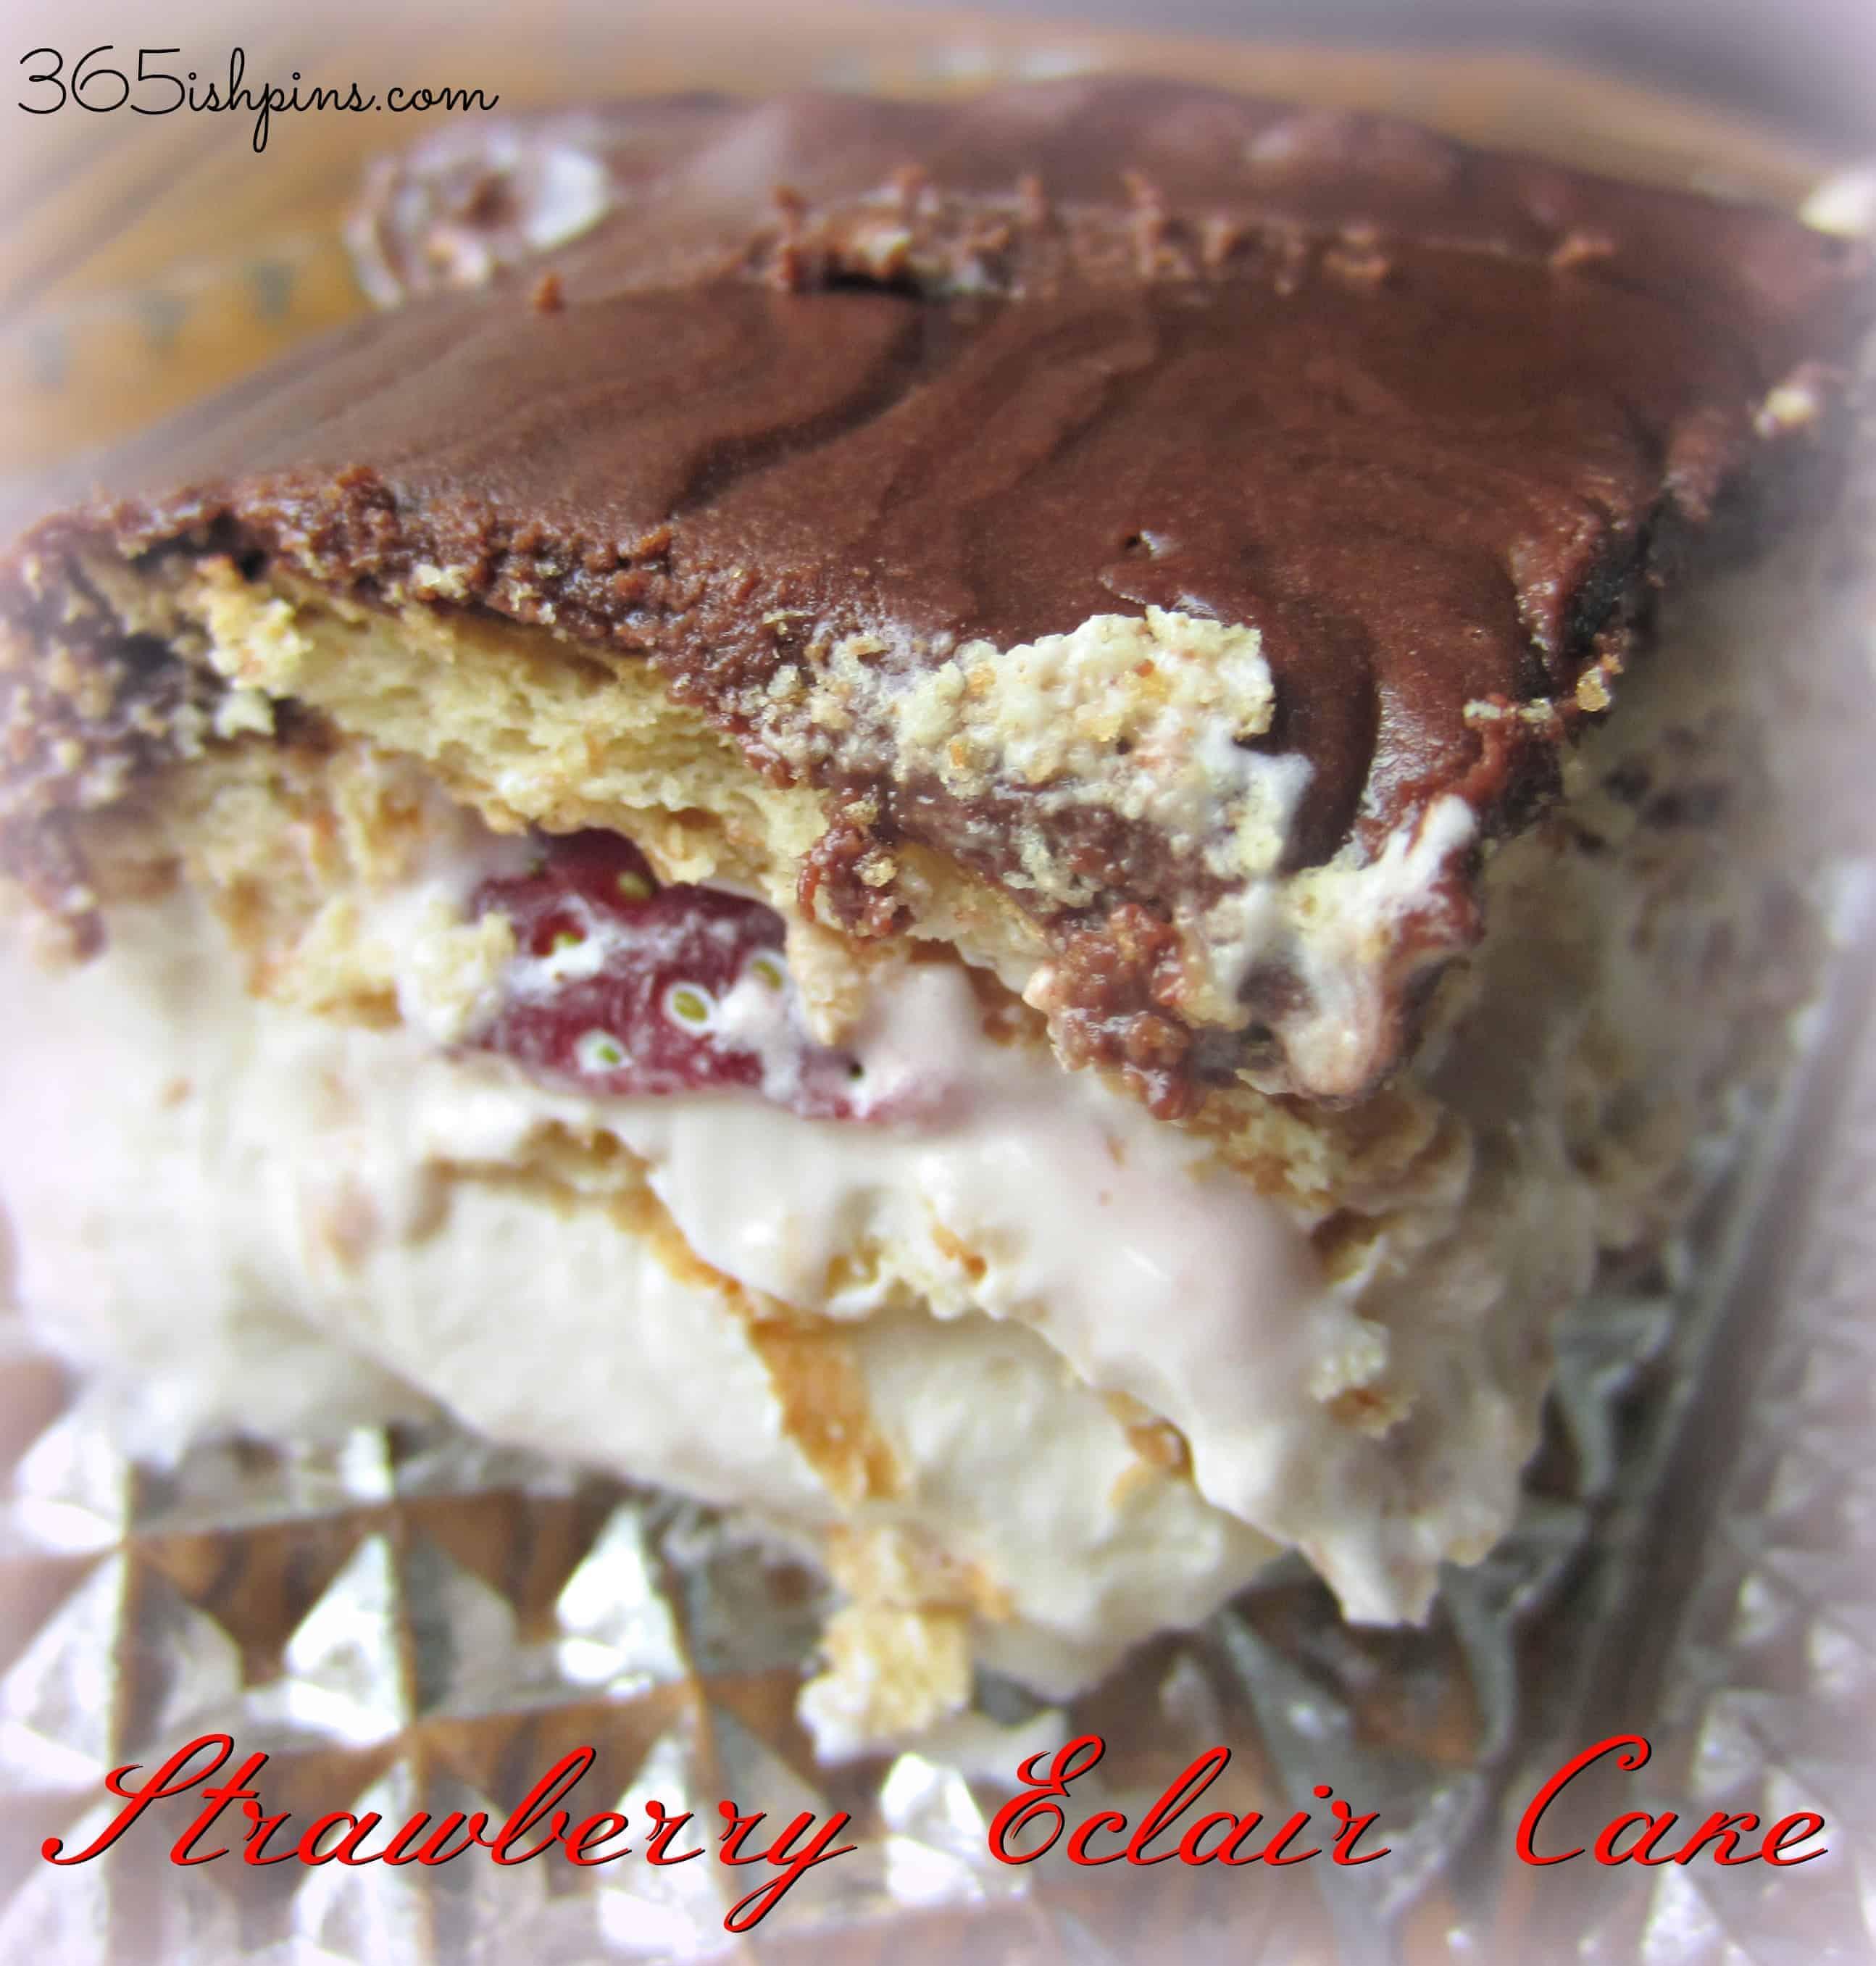 Day 333: Strawberry Eclair Cake